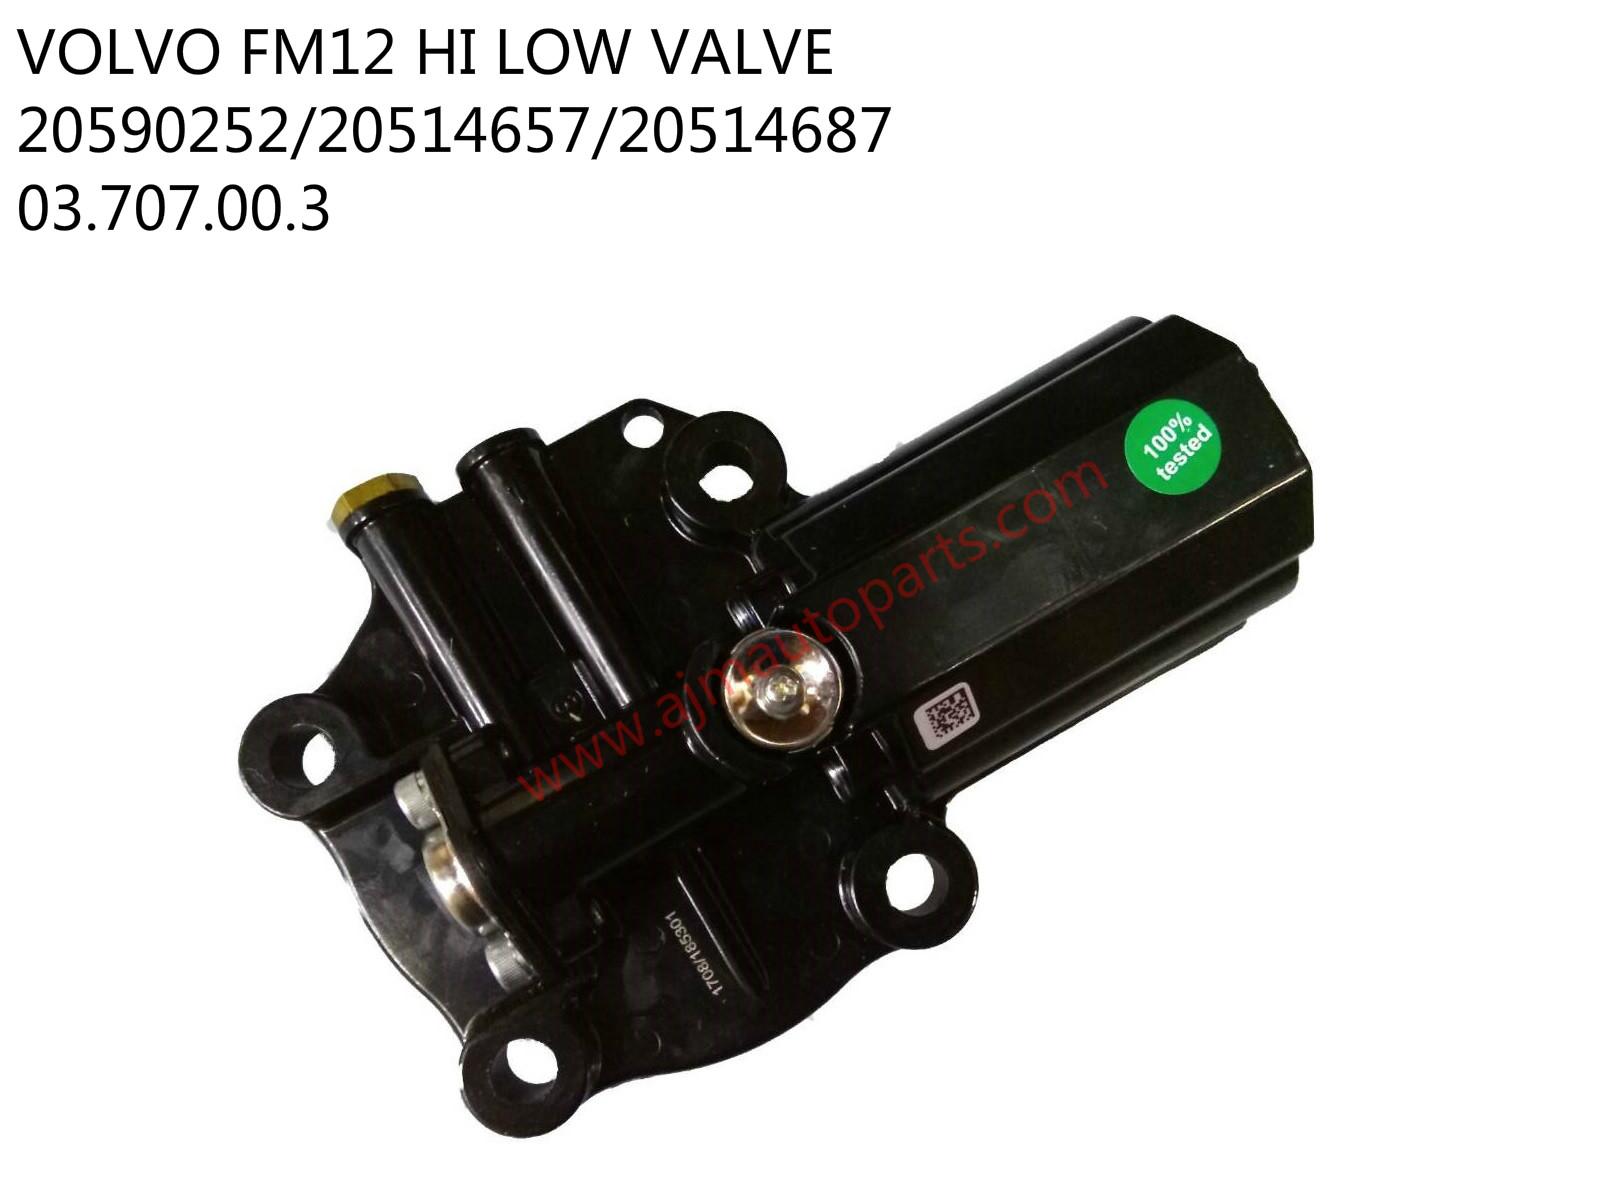 VOLVO FM12 HI LOW VALVE-20590252